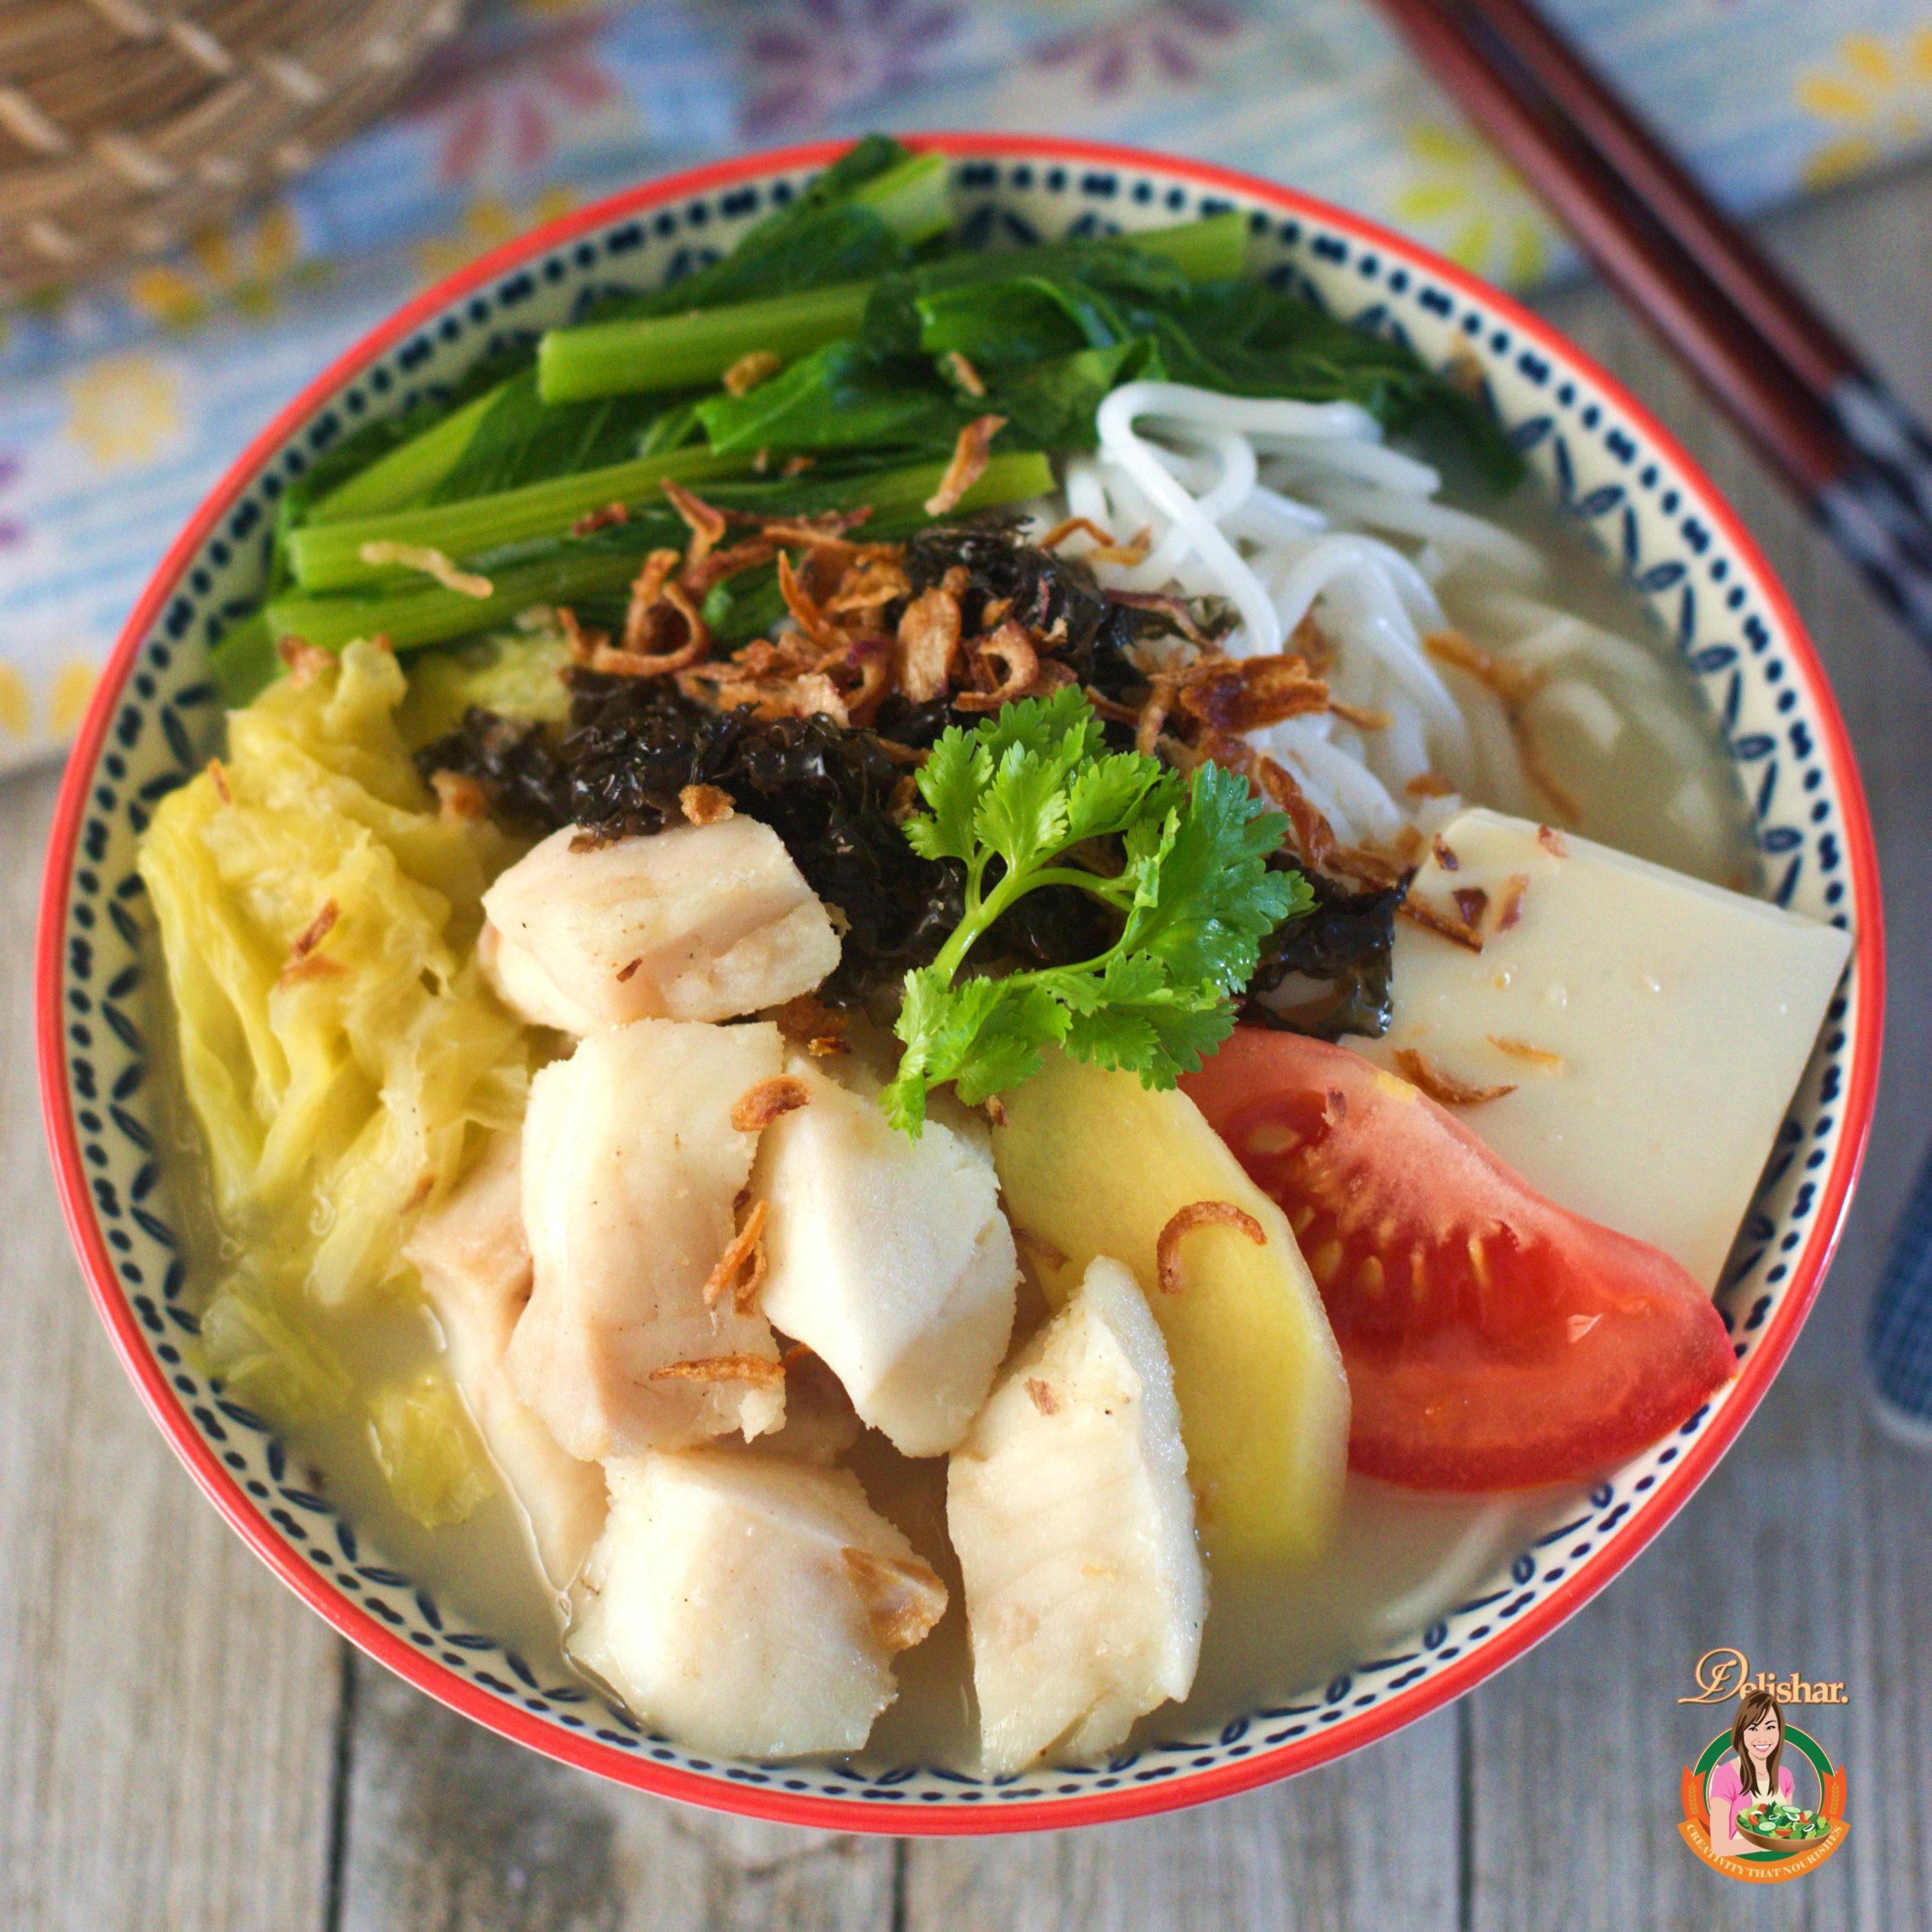 Fish Soup Beehoon Delishar Singapore Cooking Recipe And Food Blog